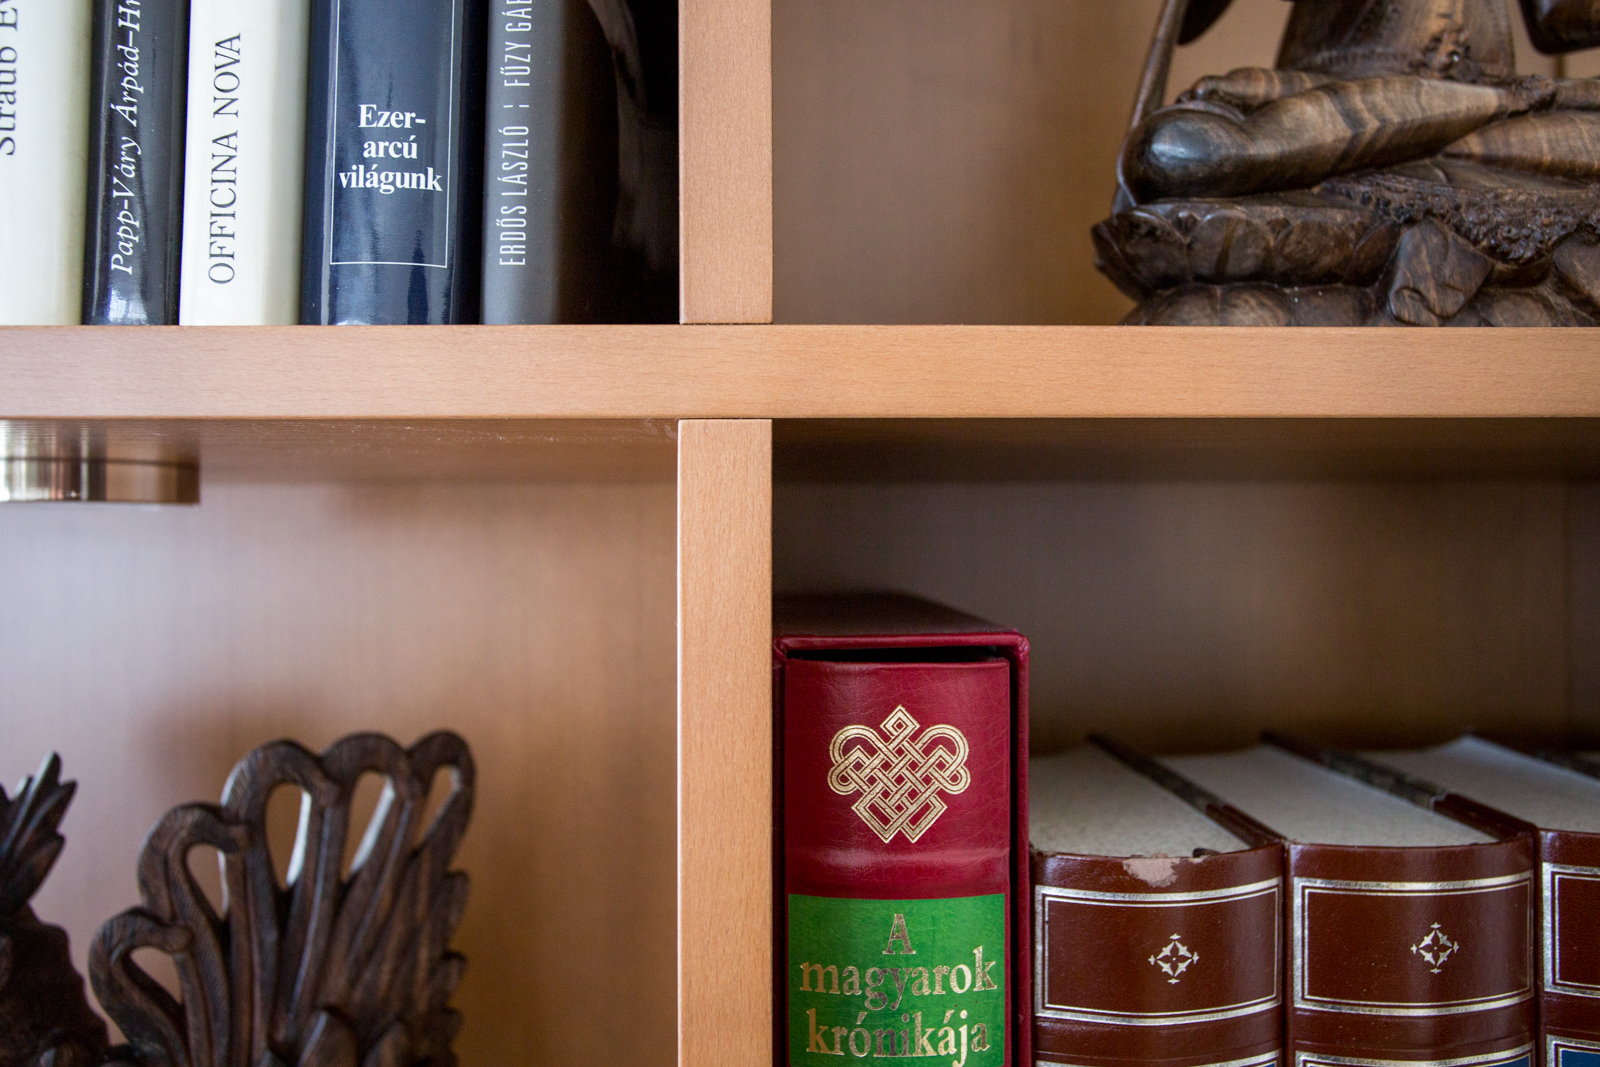 Könyvespolc bükkfa furnérból